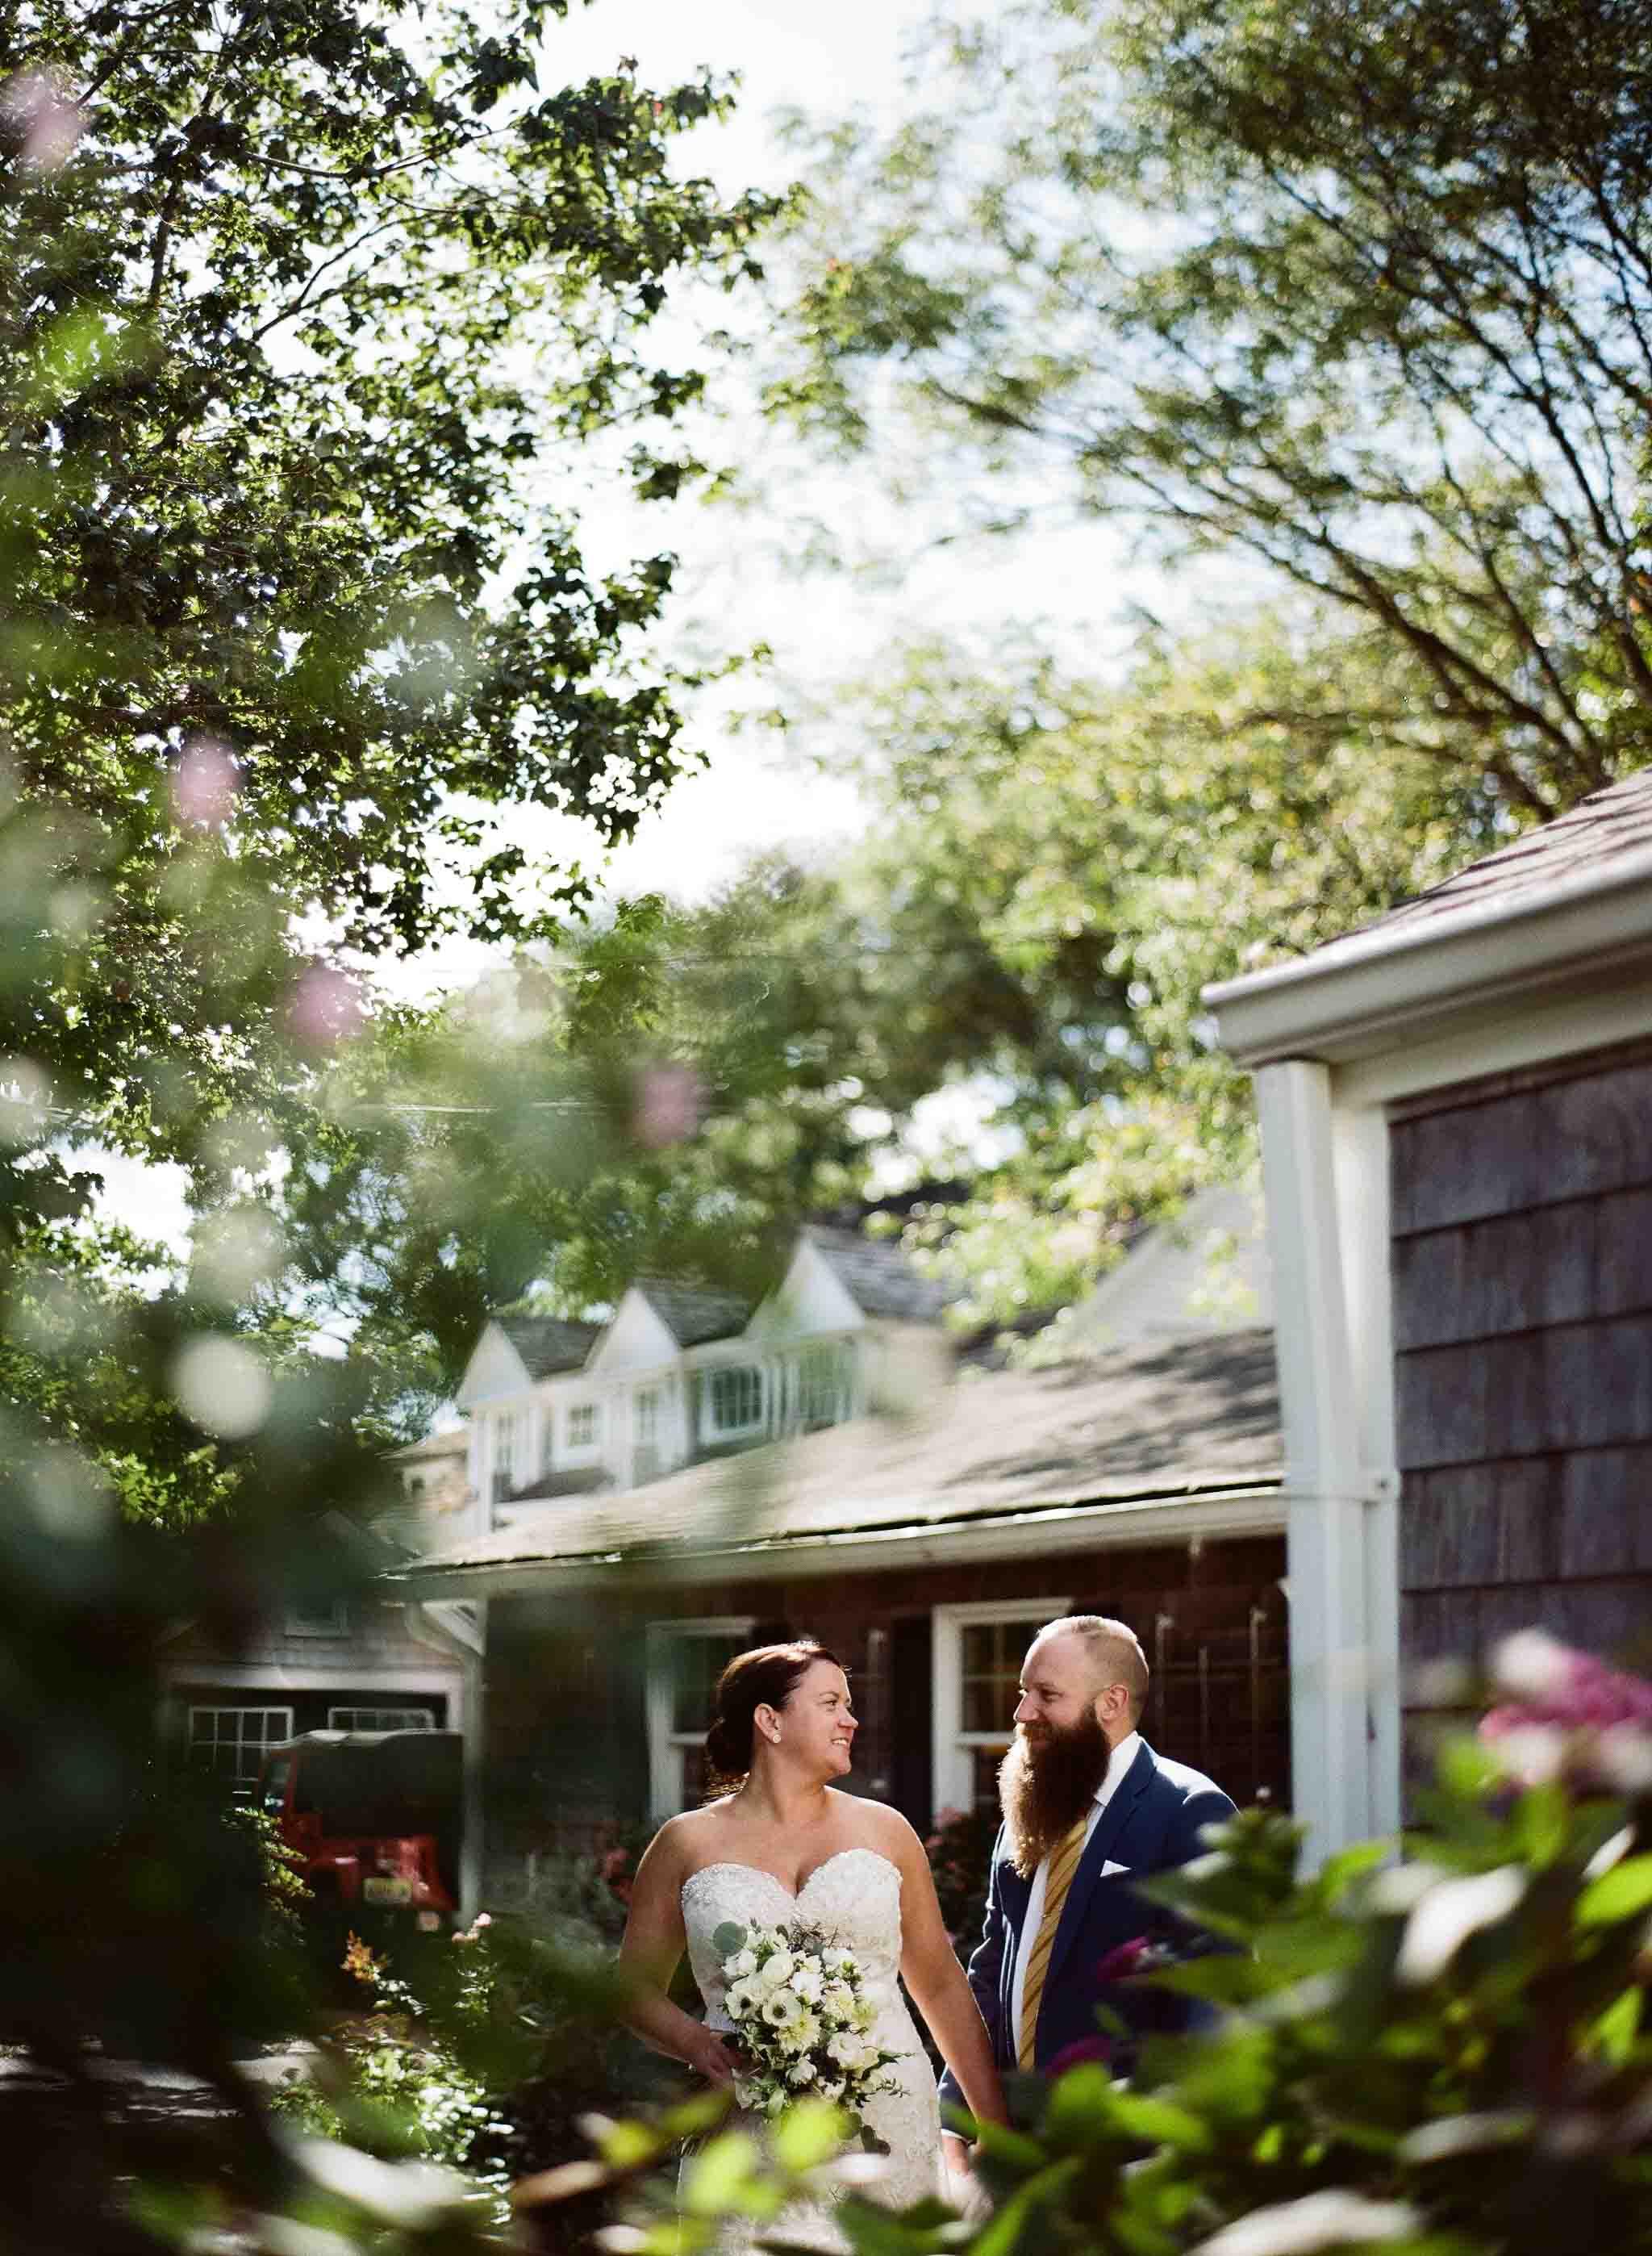 Marthas-vineyard-wedding-27.jpg